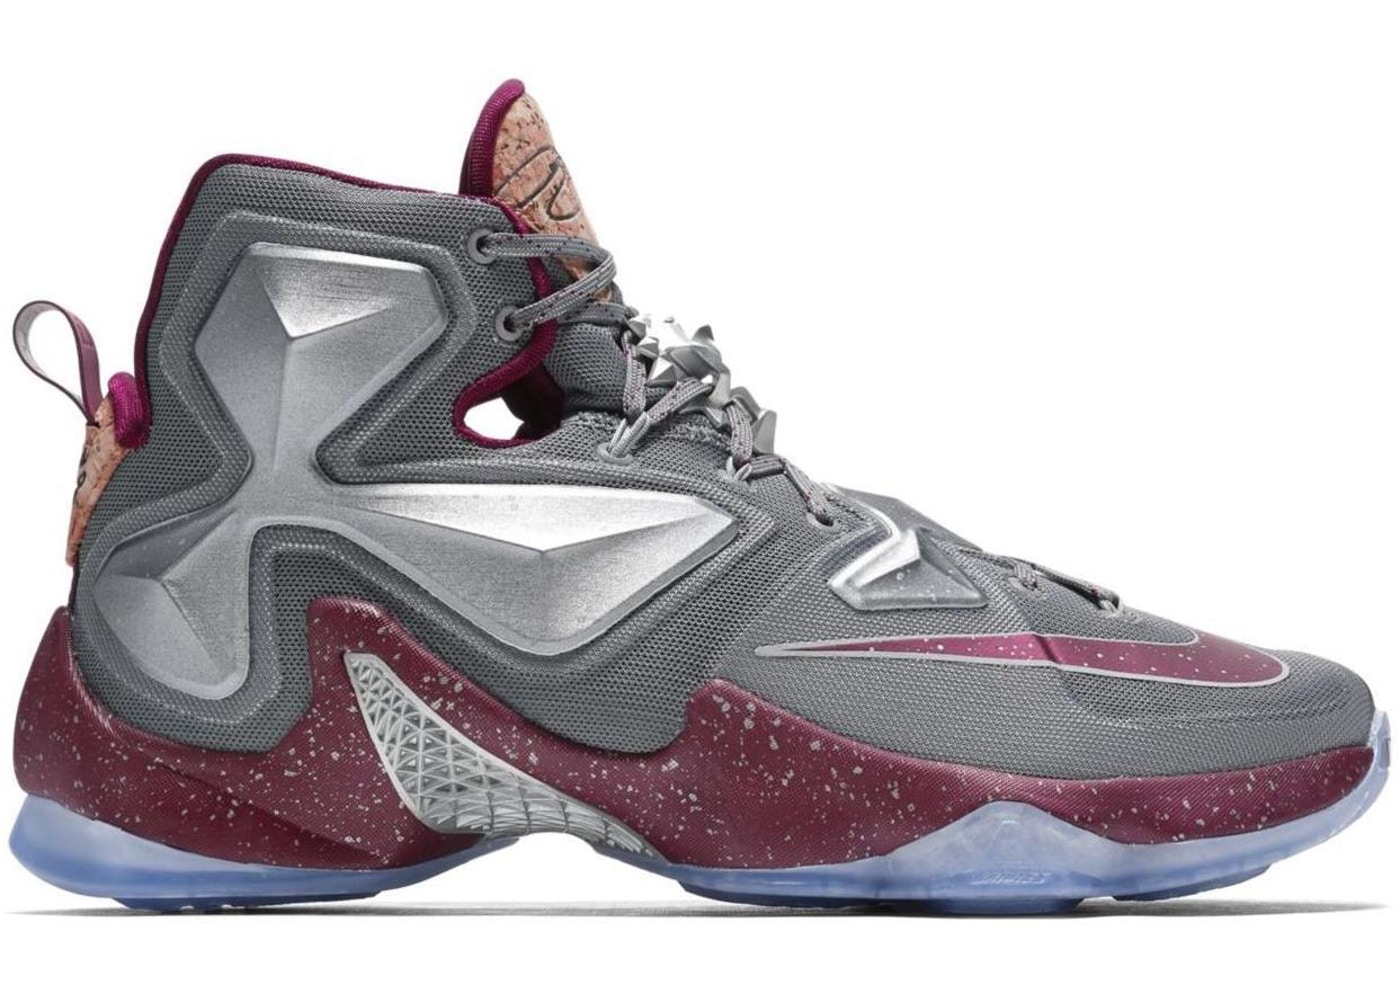 717b95b857c2 Nike LeBron 13 Opening Night - 823301-060 823300-060